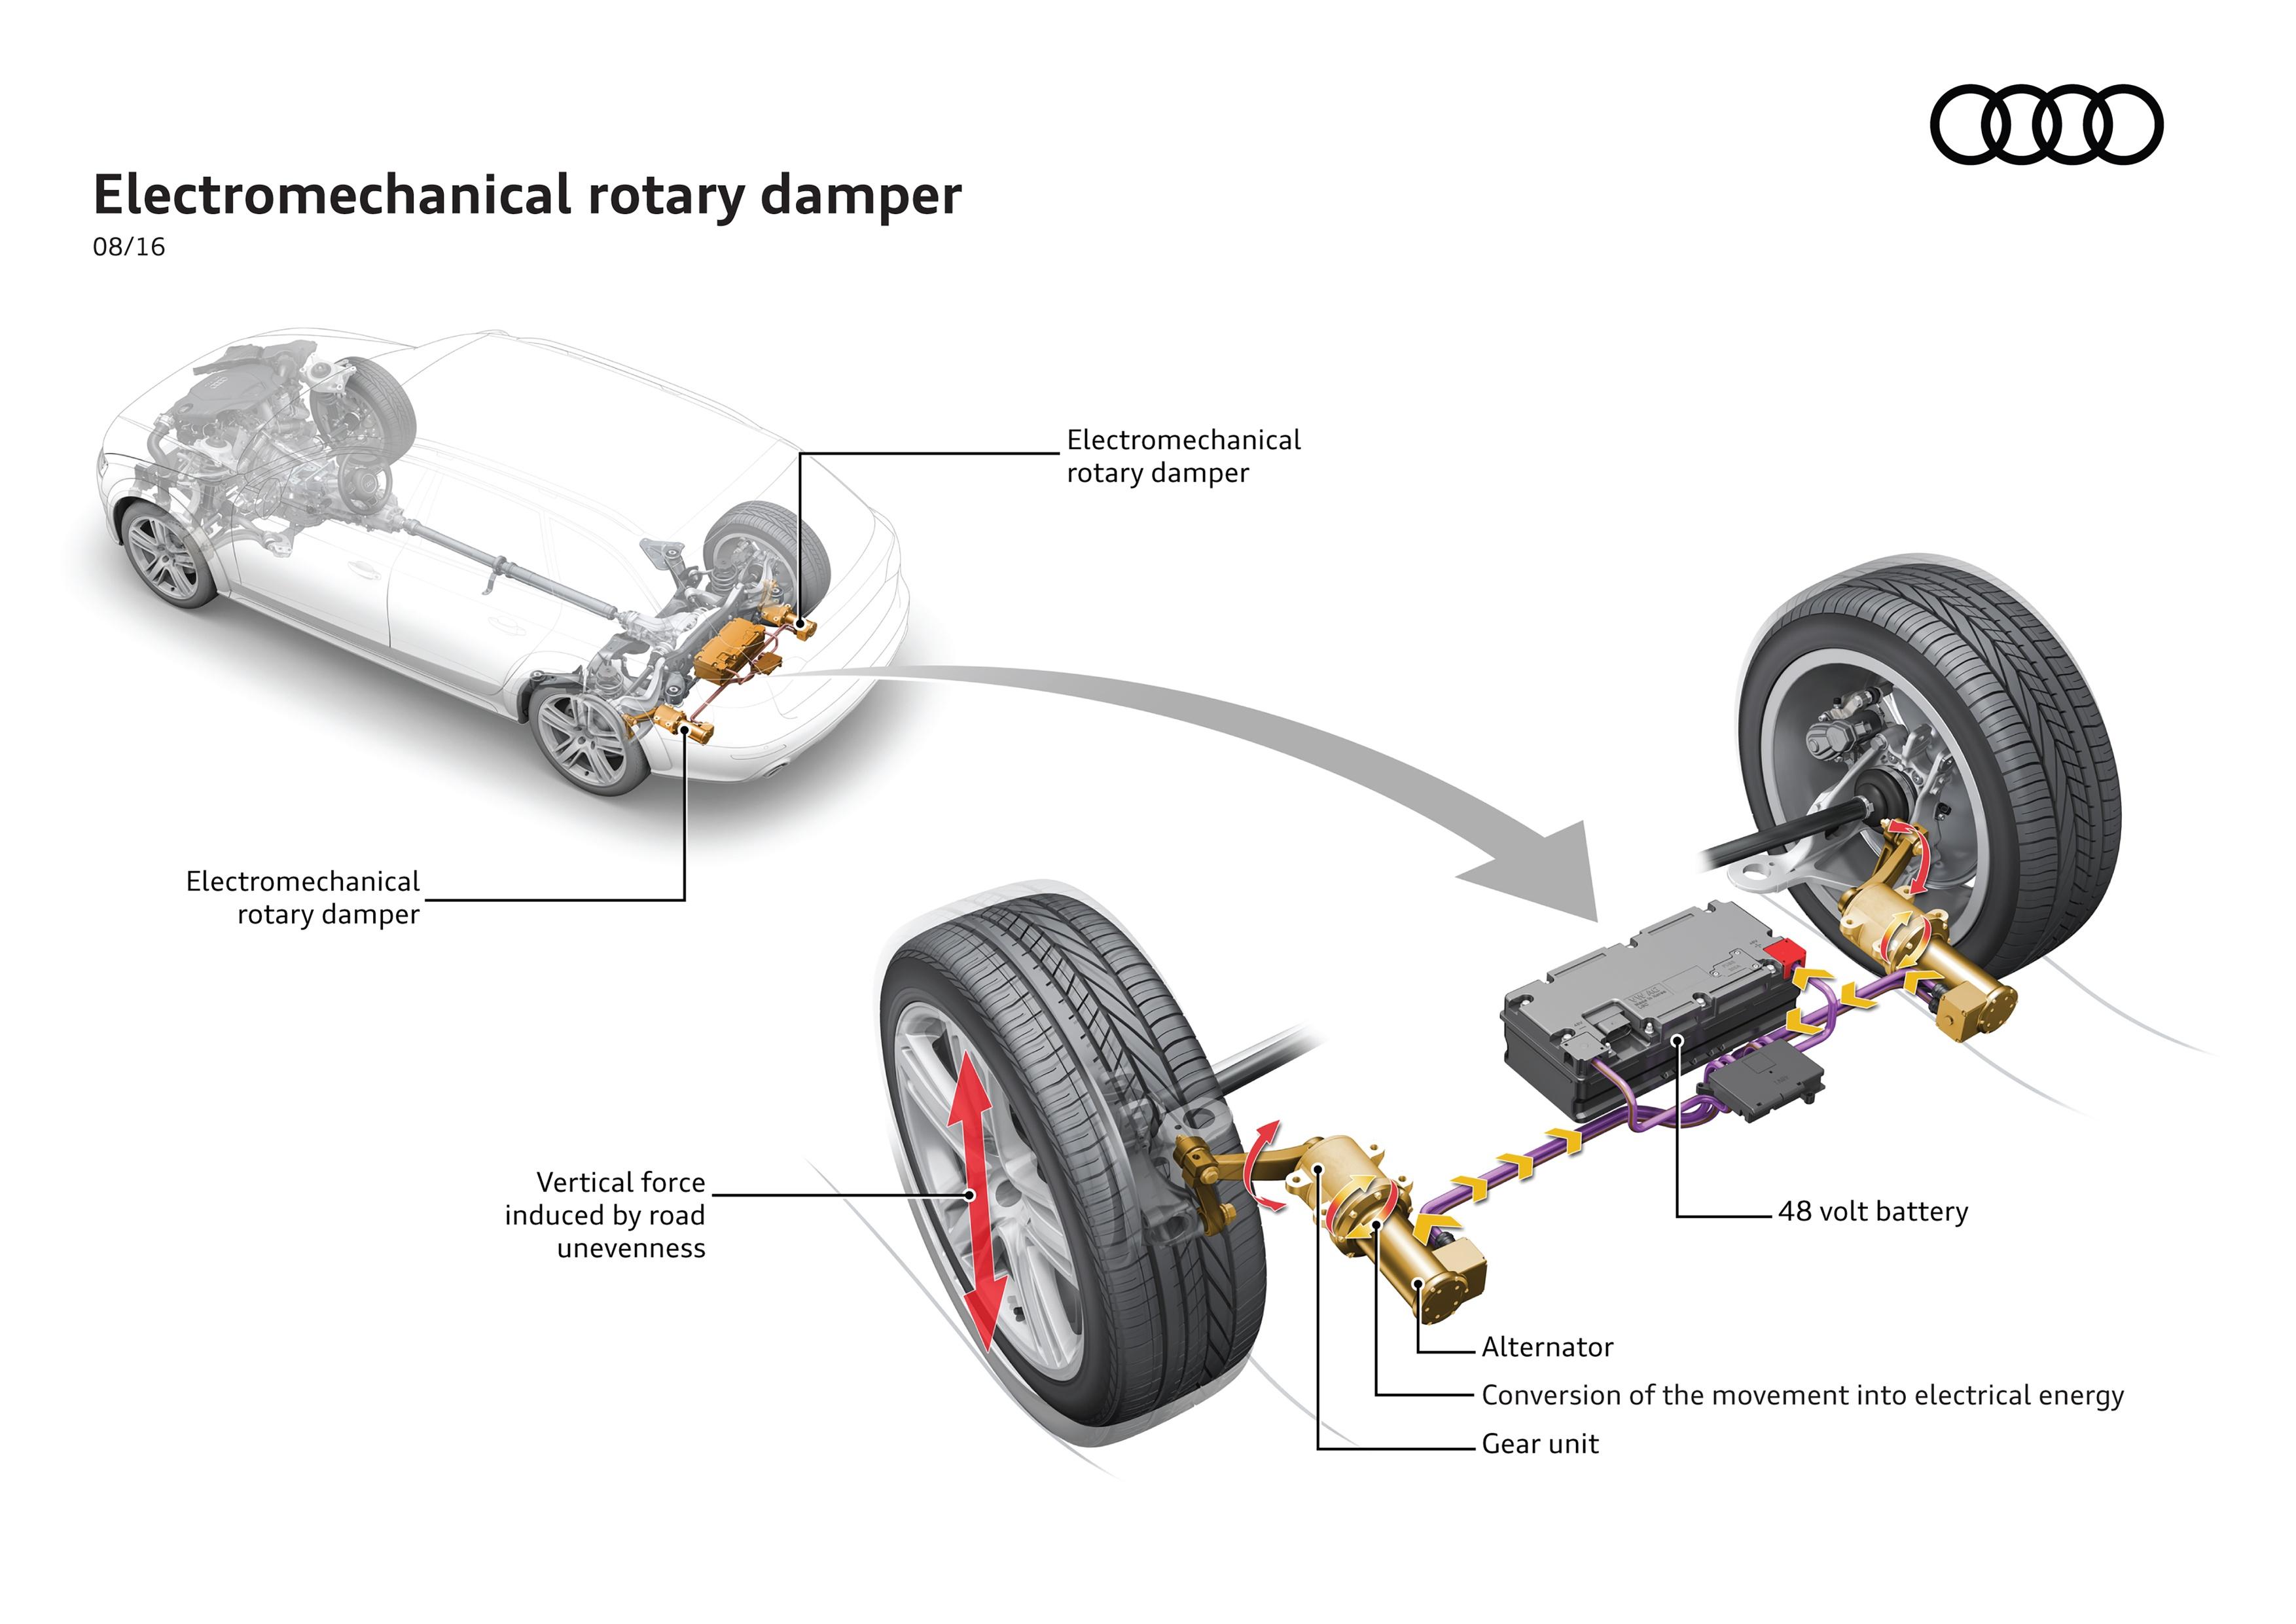 Audi Electromechanical rotary damper  Source: Audi